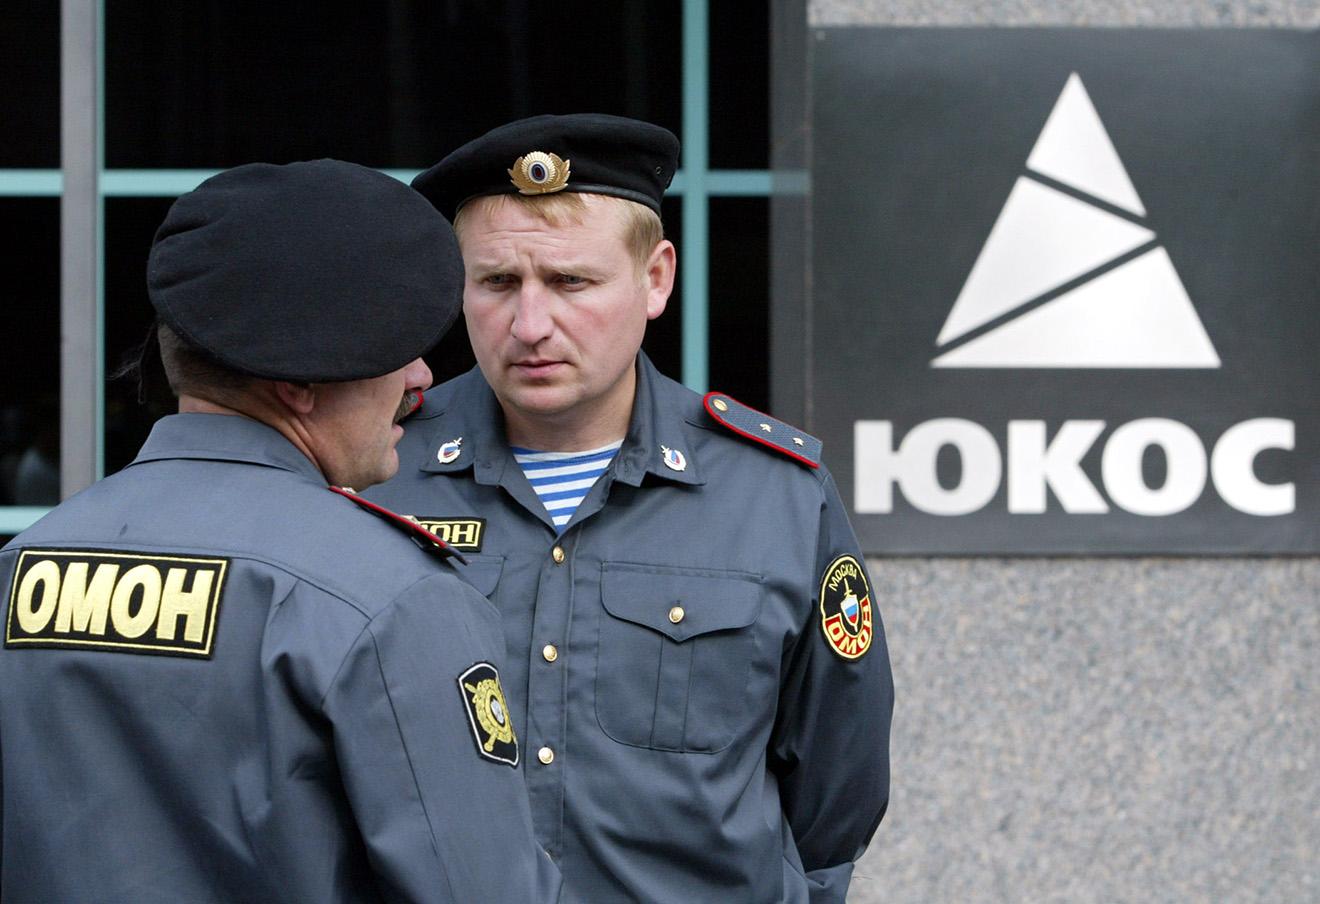 Фото: Виктор Коротаев / Reuters / Архив